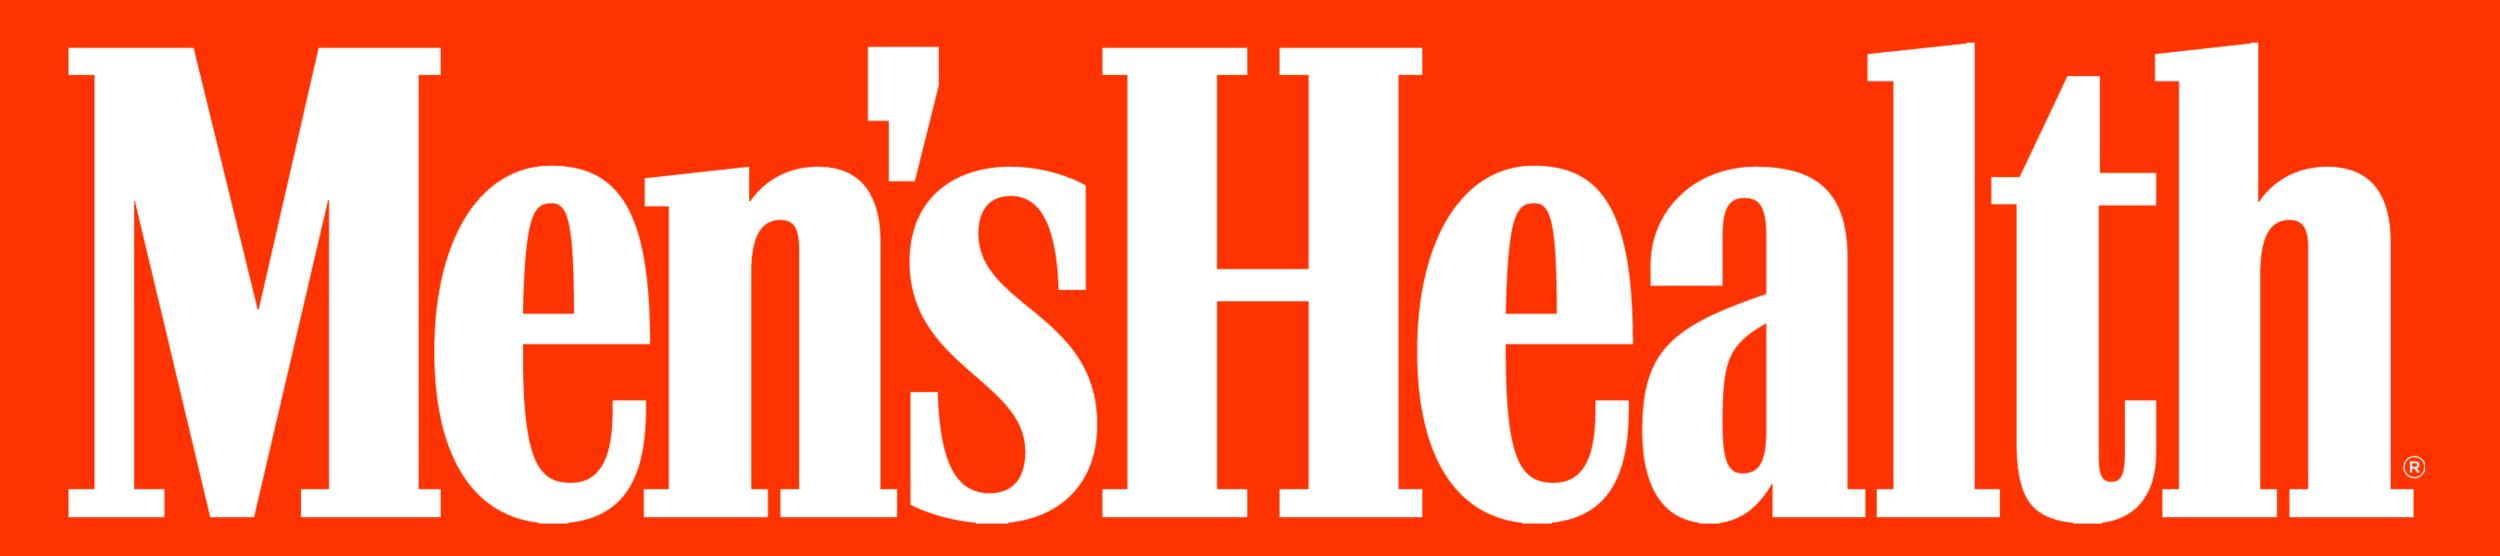 Men's Health Logo.png